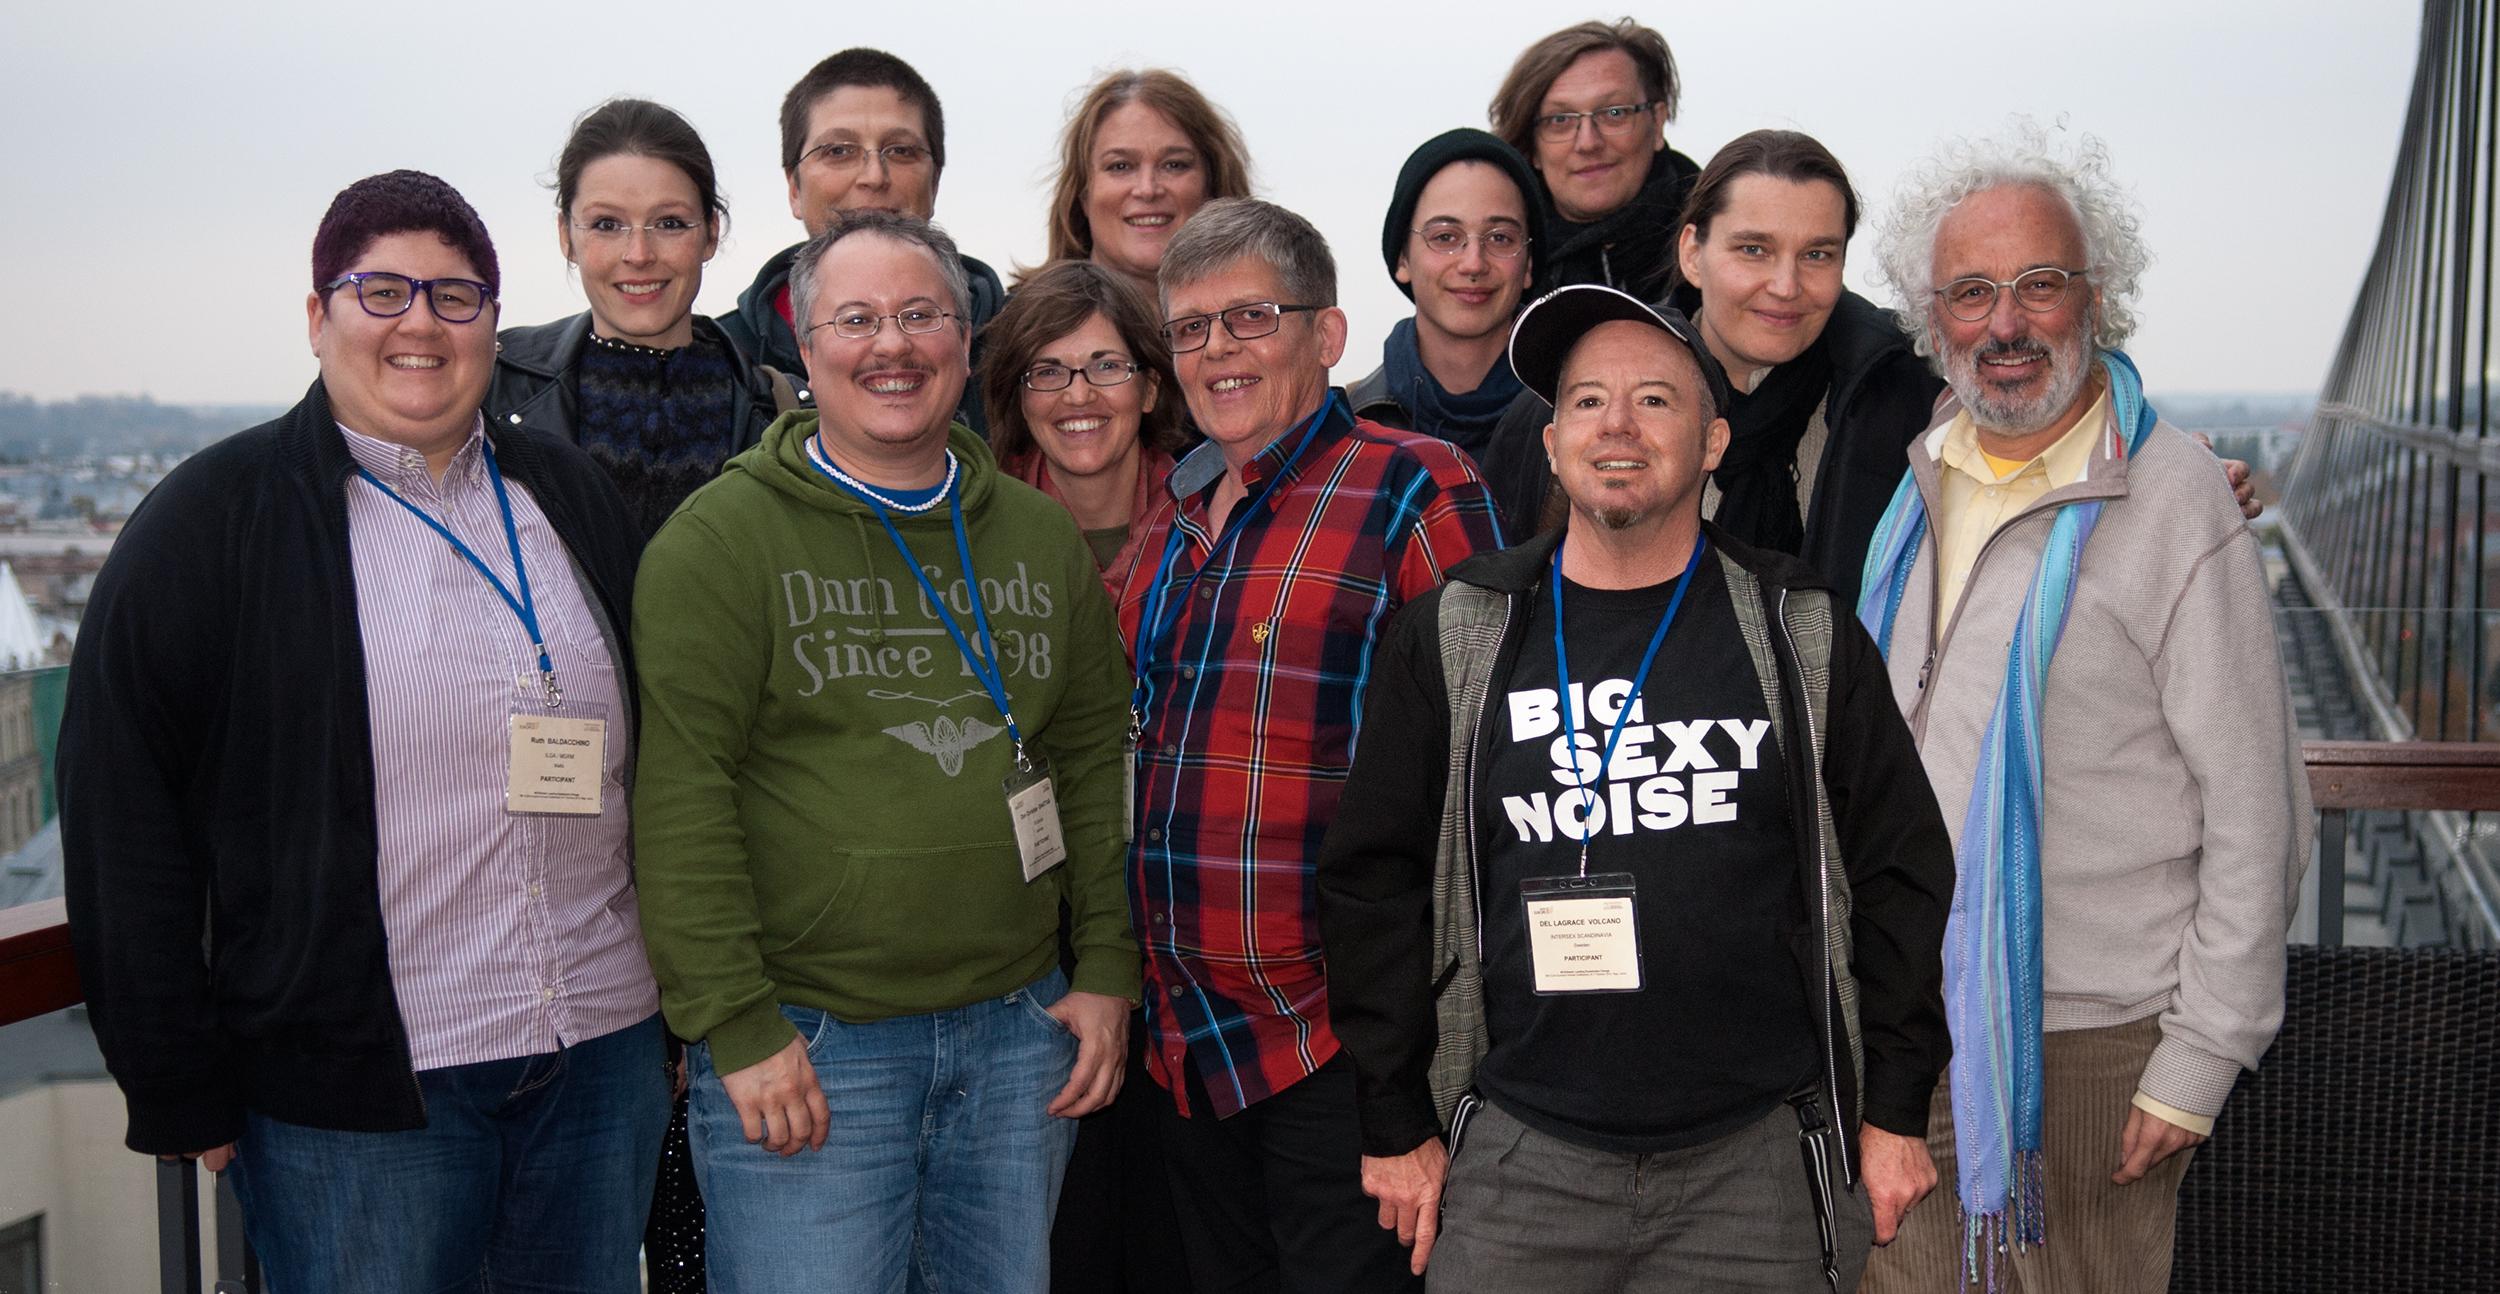 european intersex meeting 2014 riga